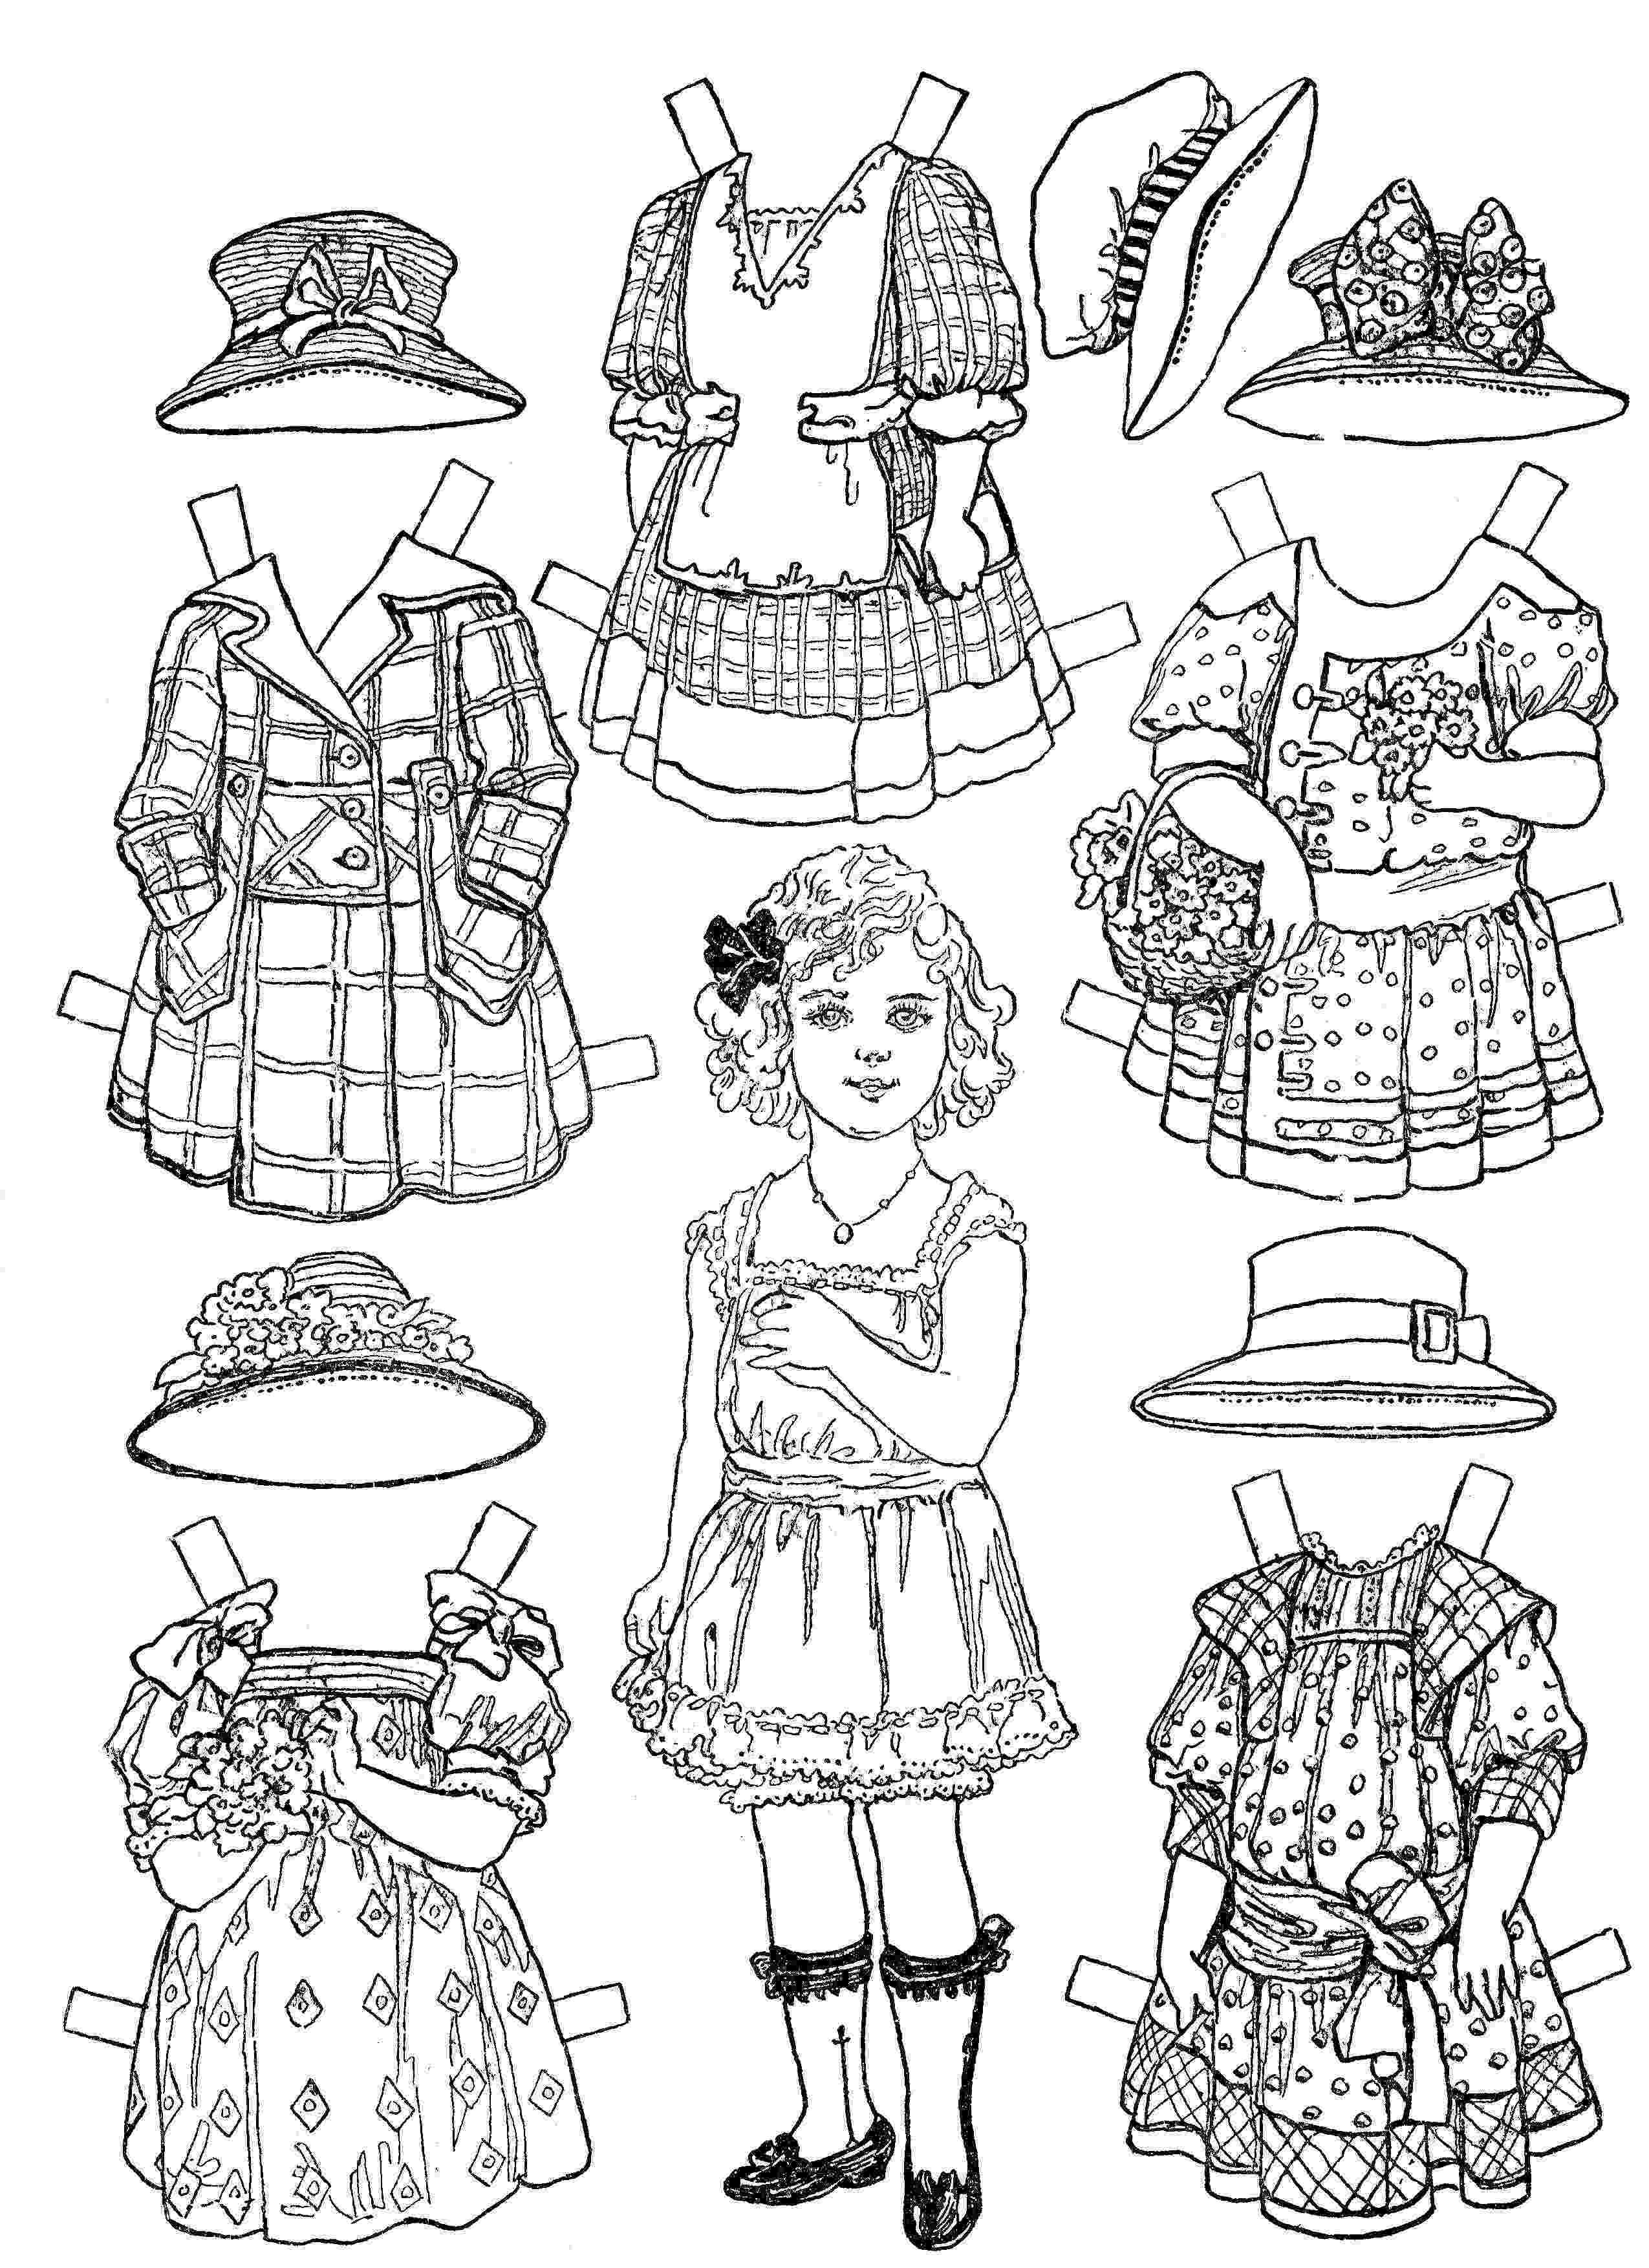 paper dress up dolls printable printable paper dolls clothes and accessories paper dolls printable dress up